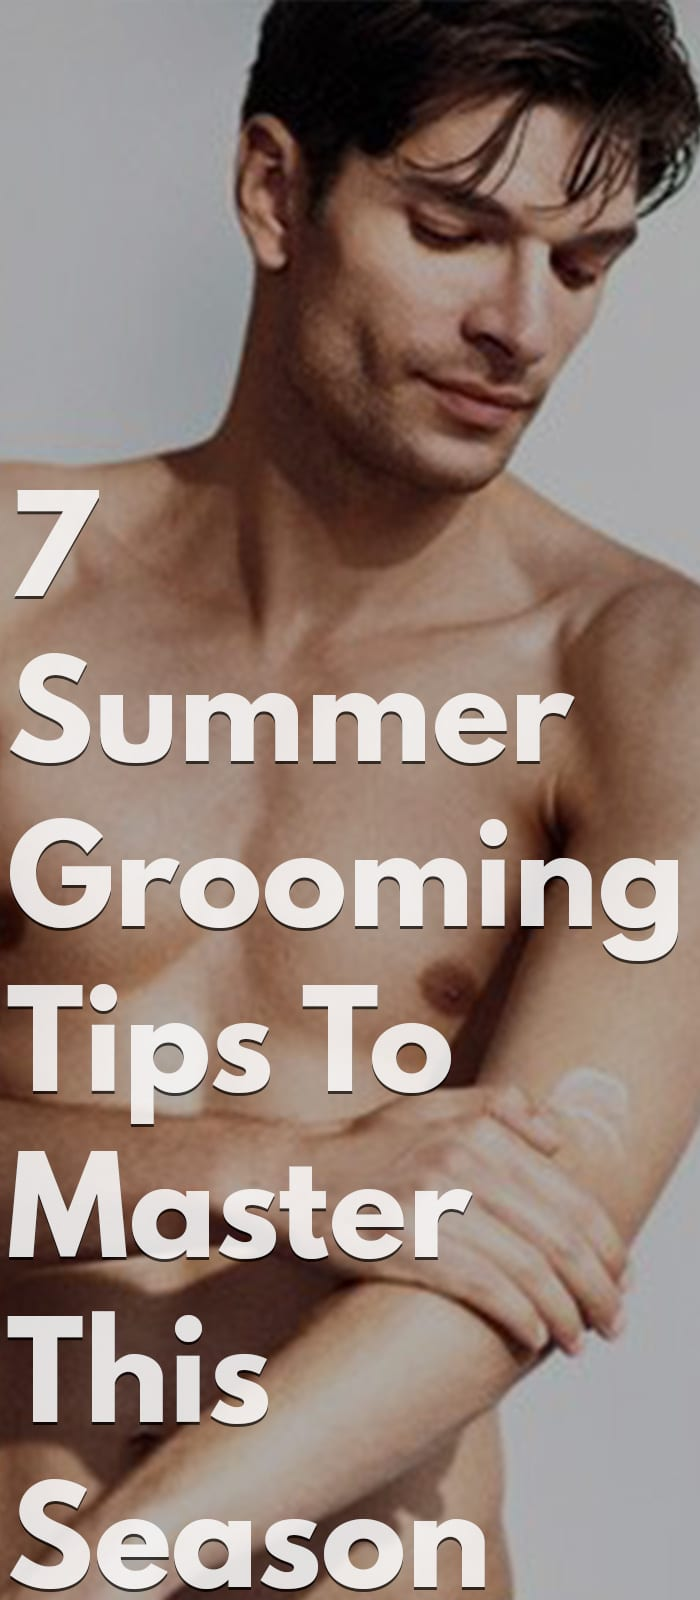 7 Summer Grooming Hacks To Master This Season